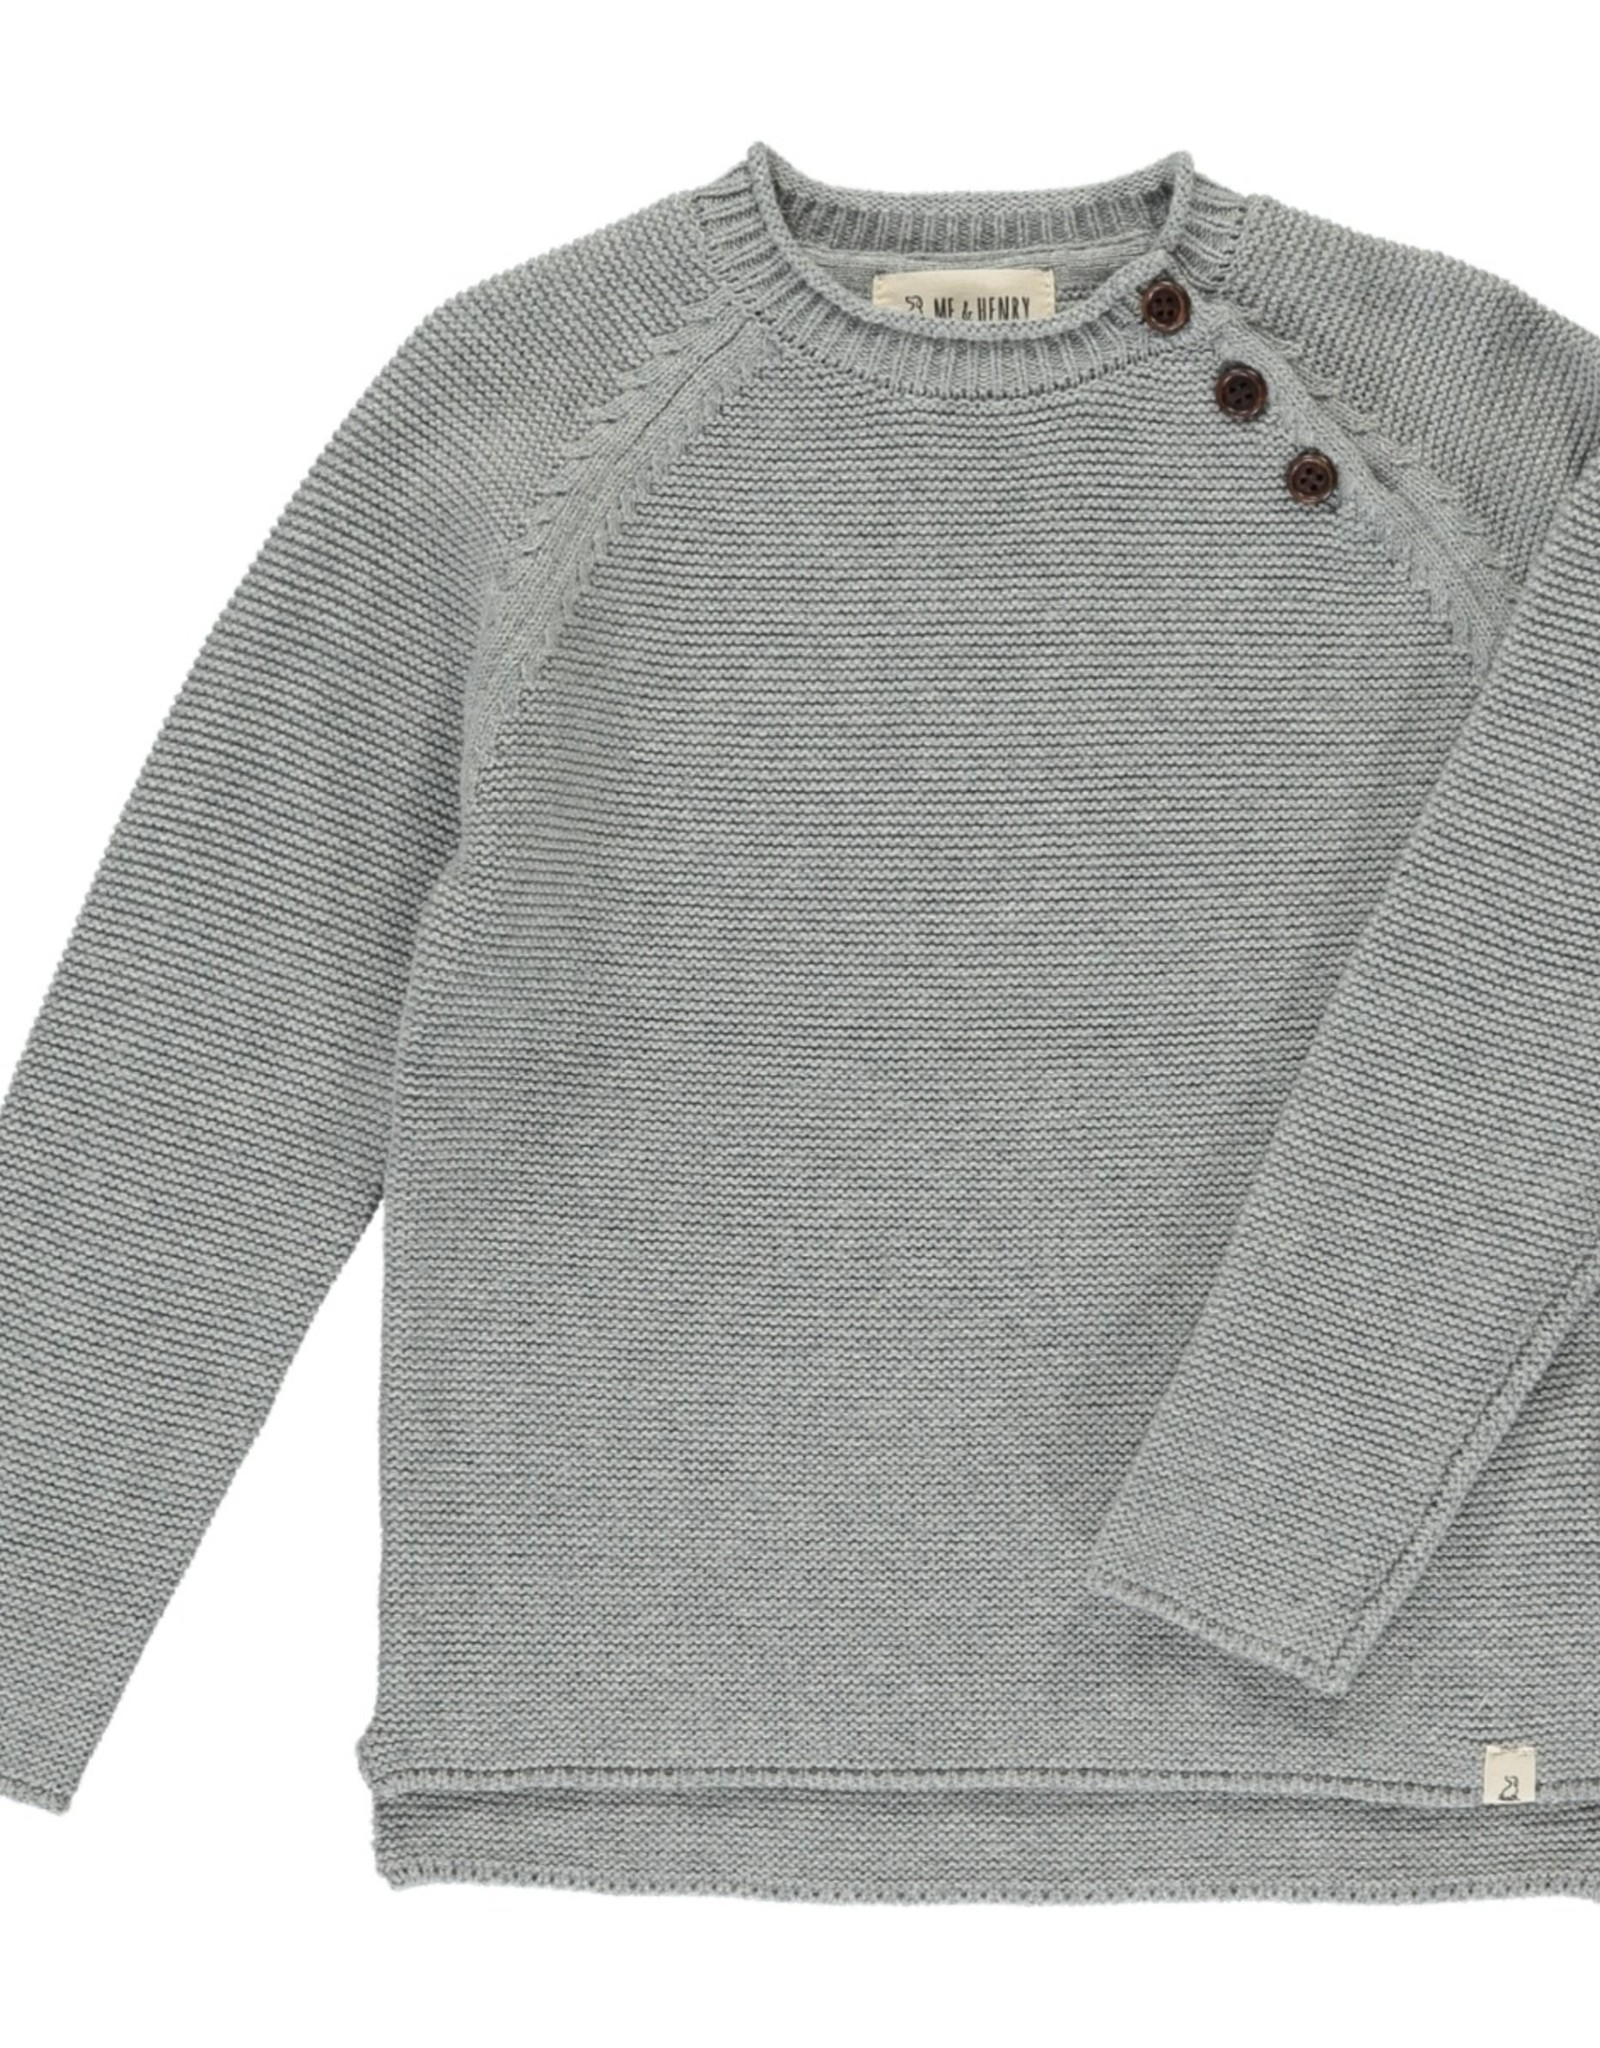 Me & Henry sweater- grey